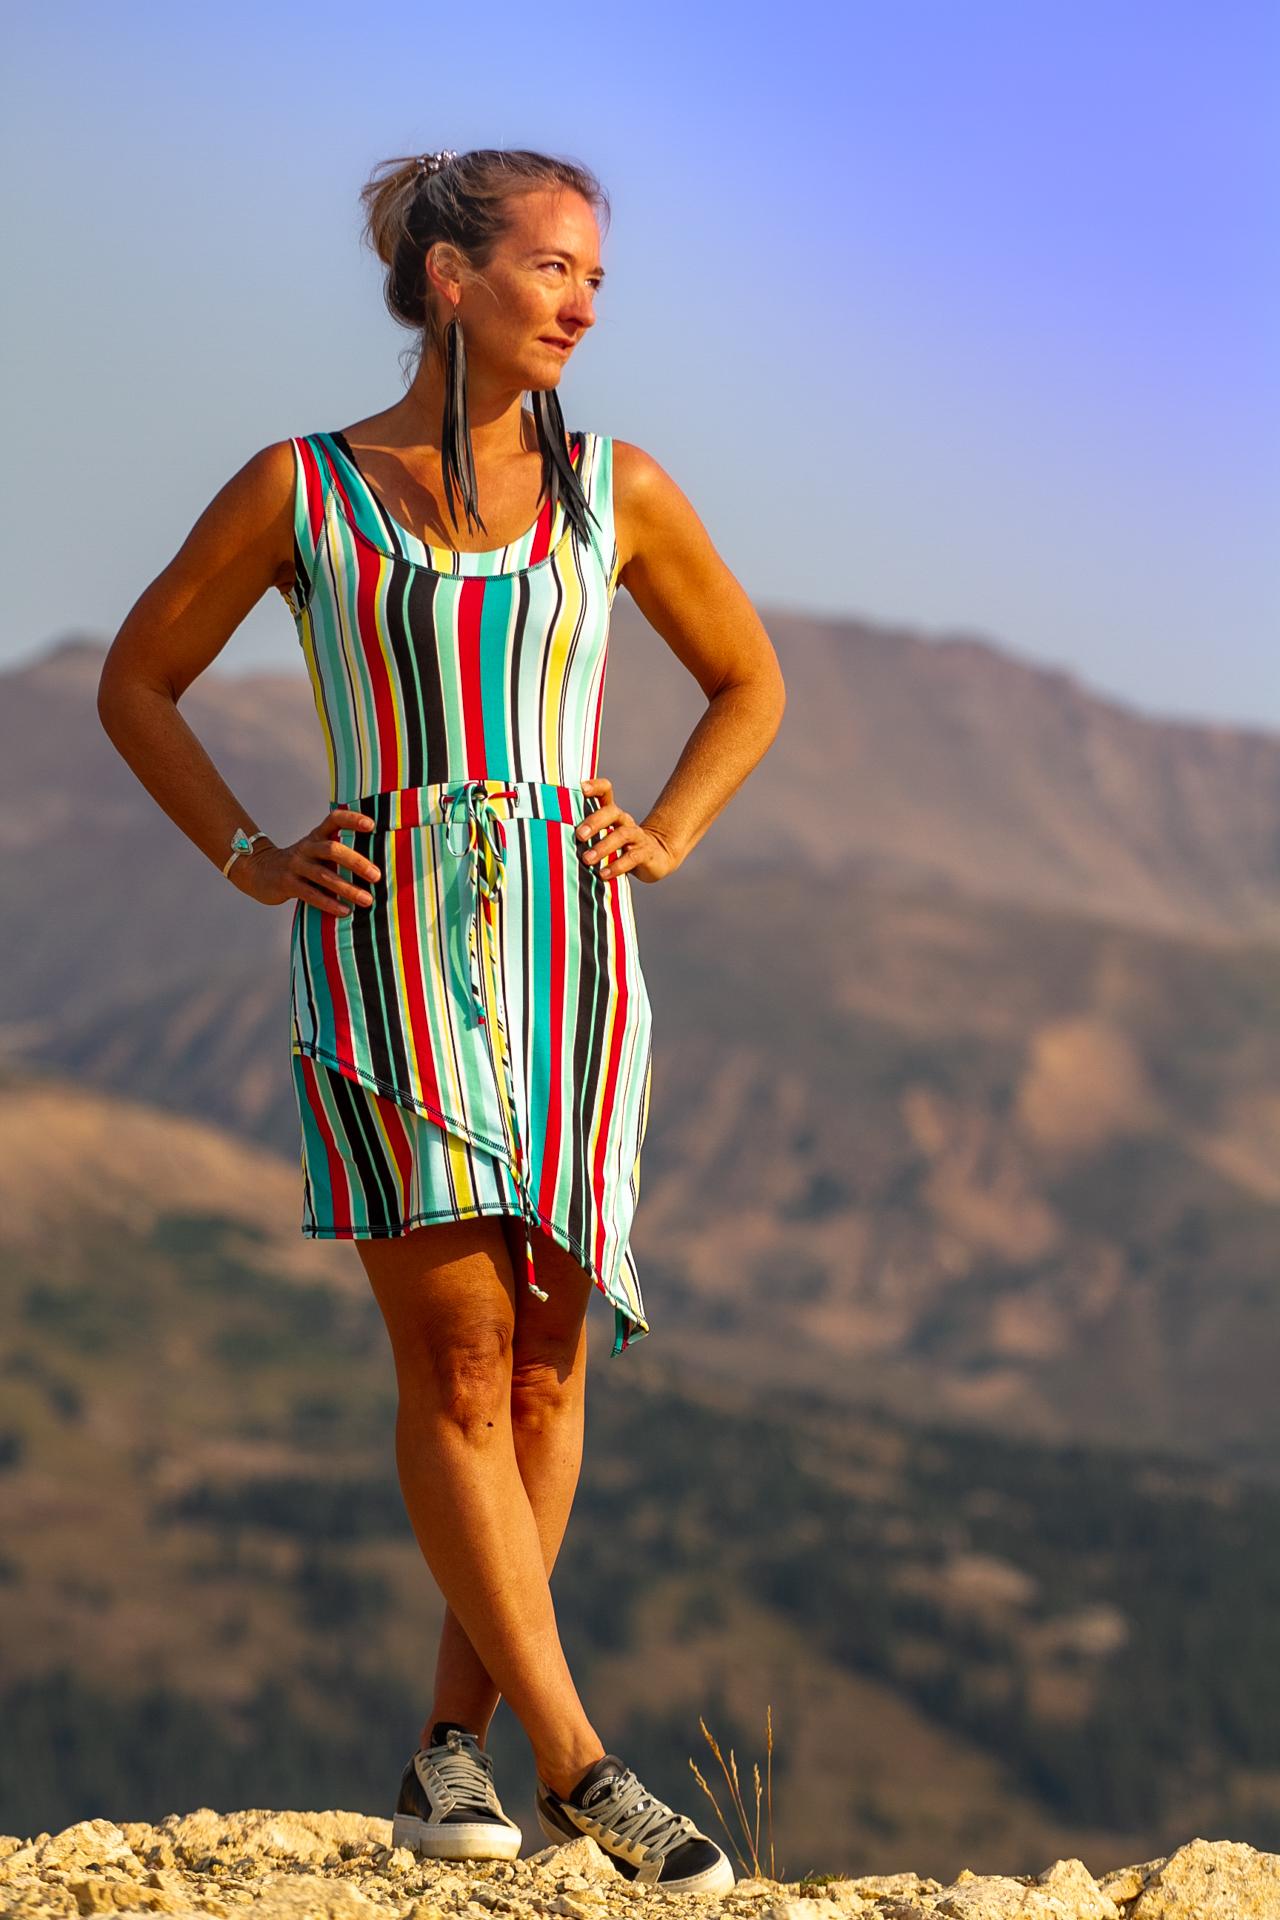 Fashion Designer Autumn Teneyl wearing  striped boho dress in the mountains